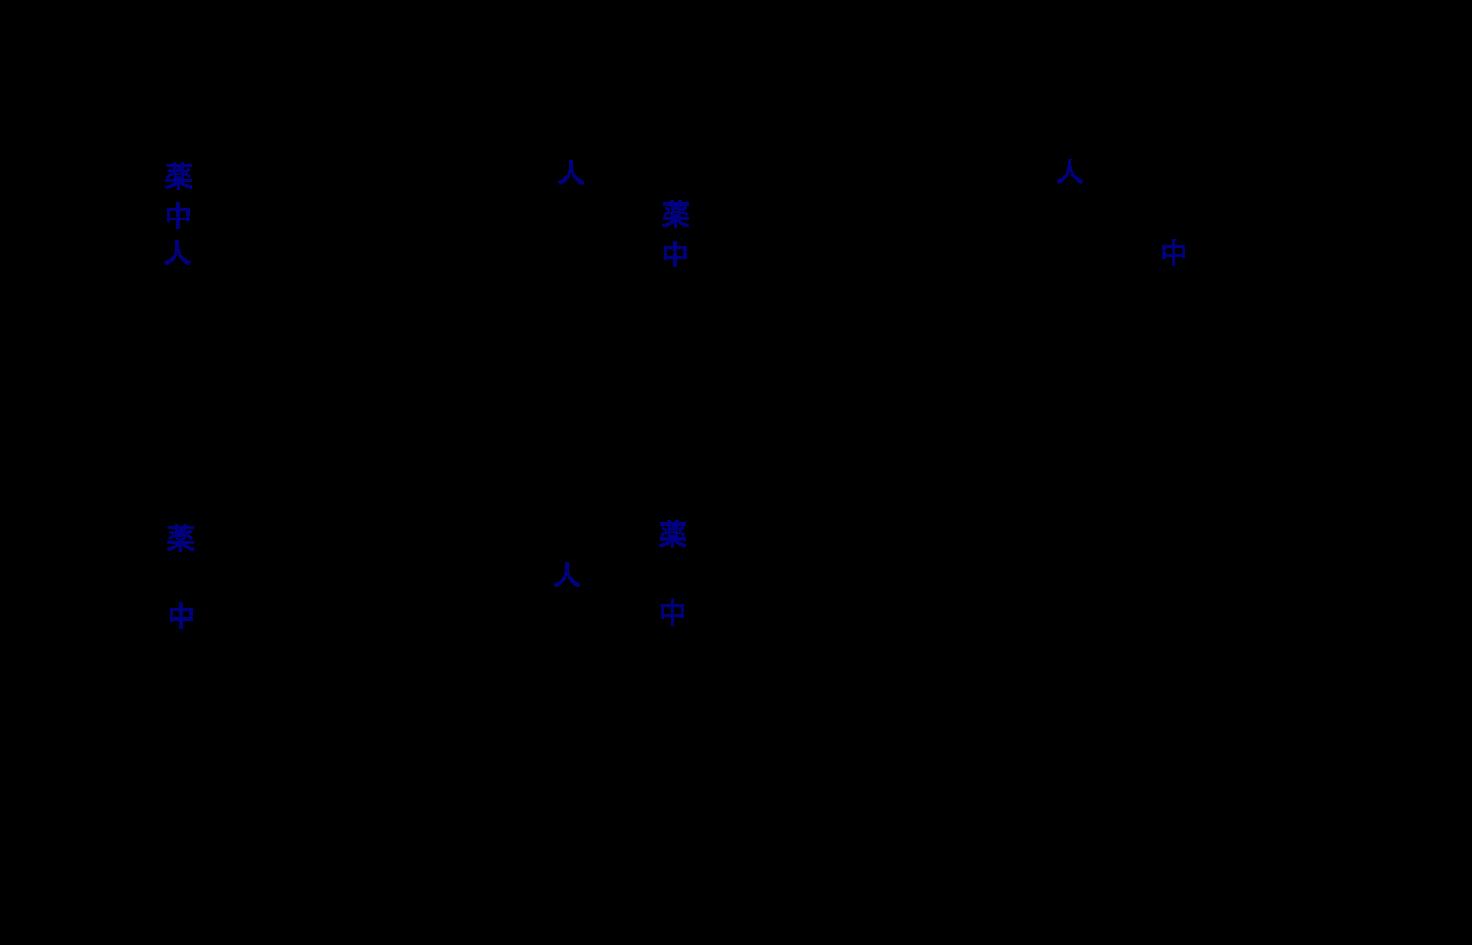 roota-5chords